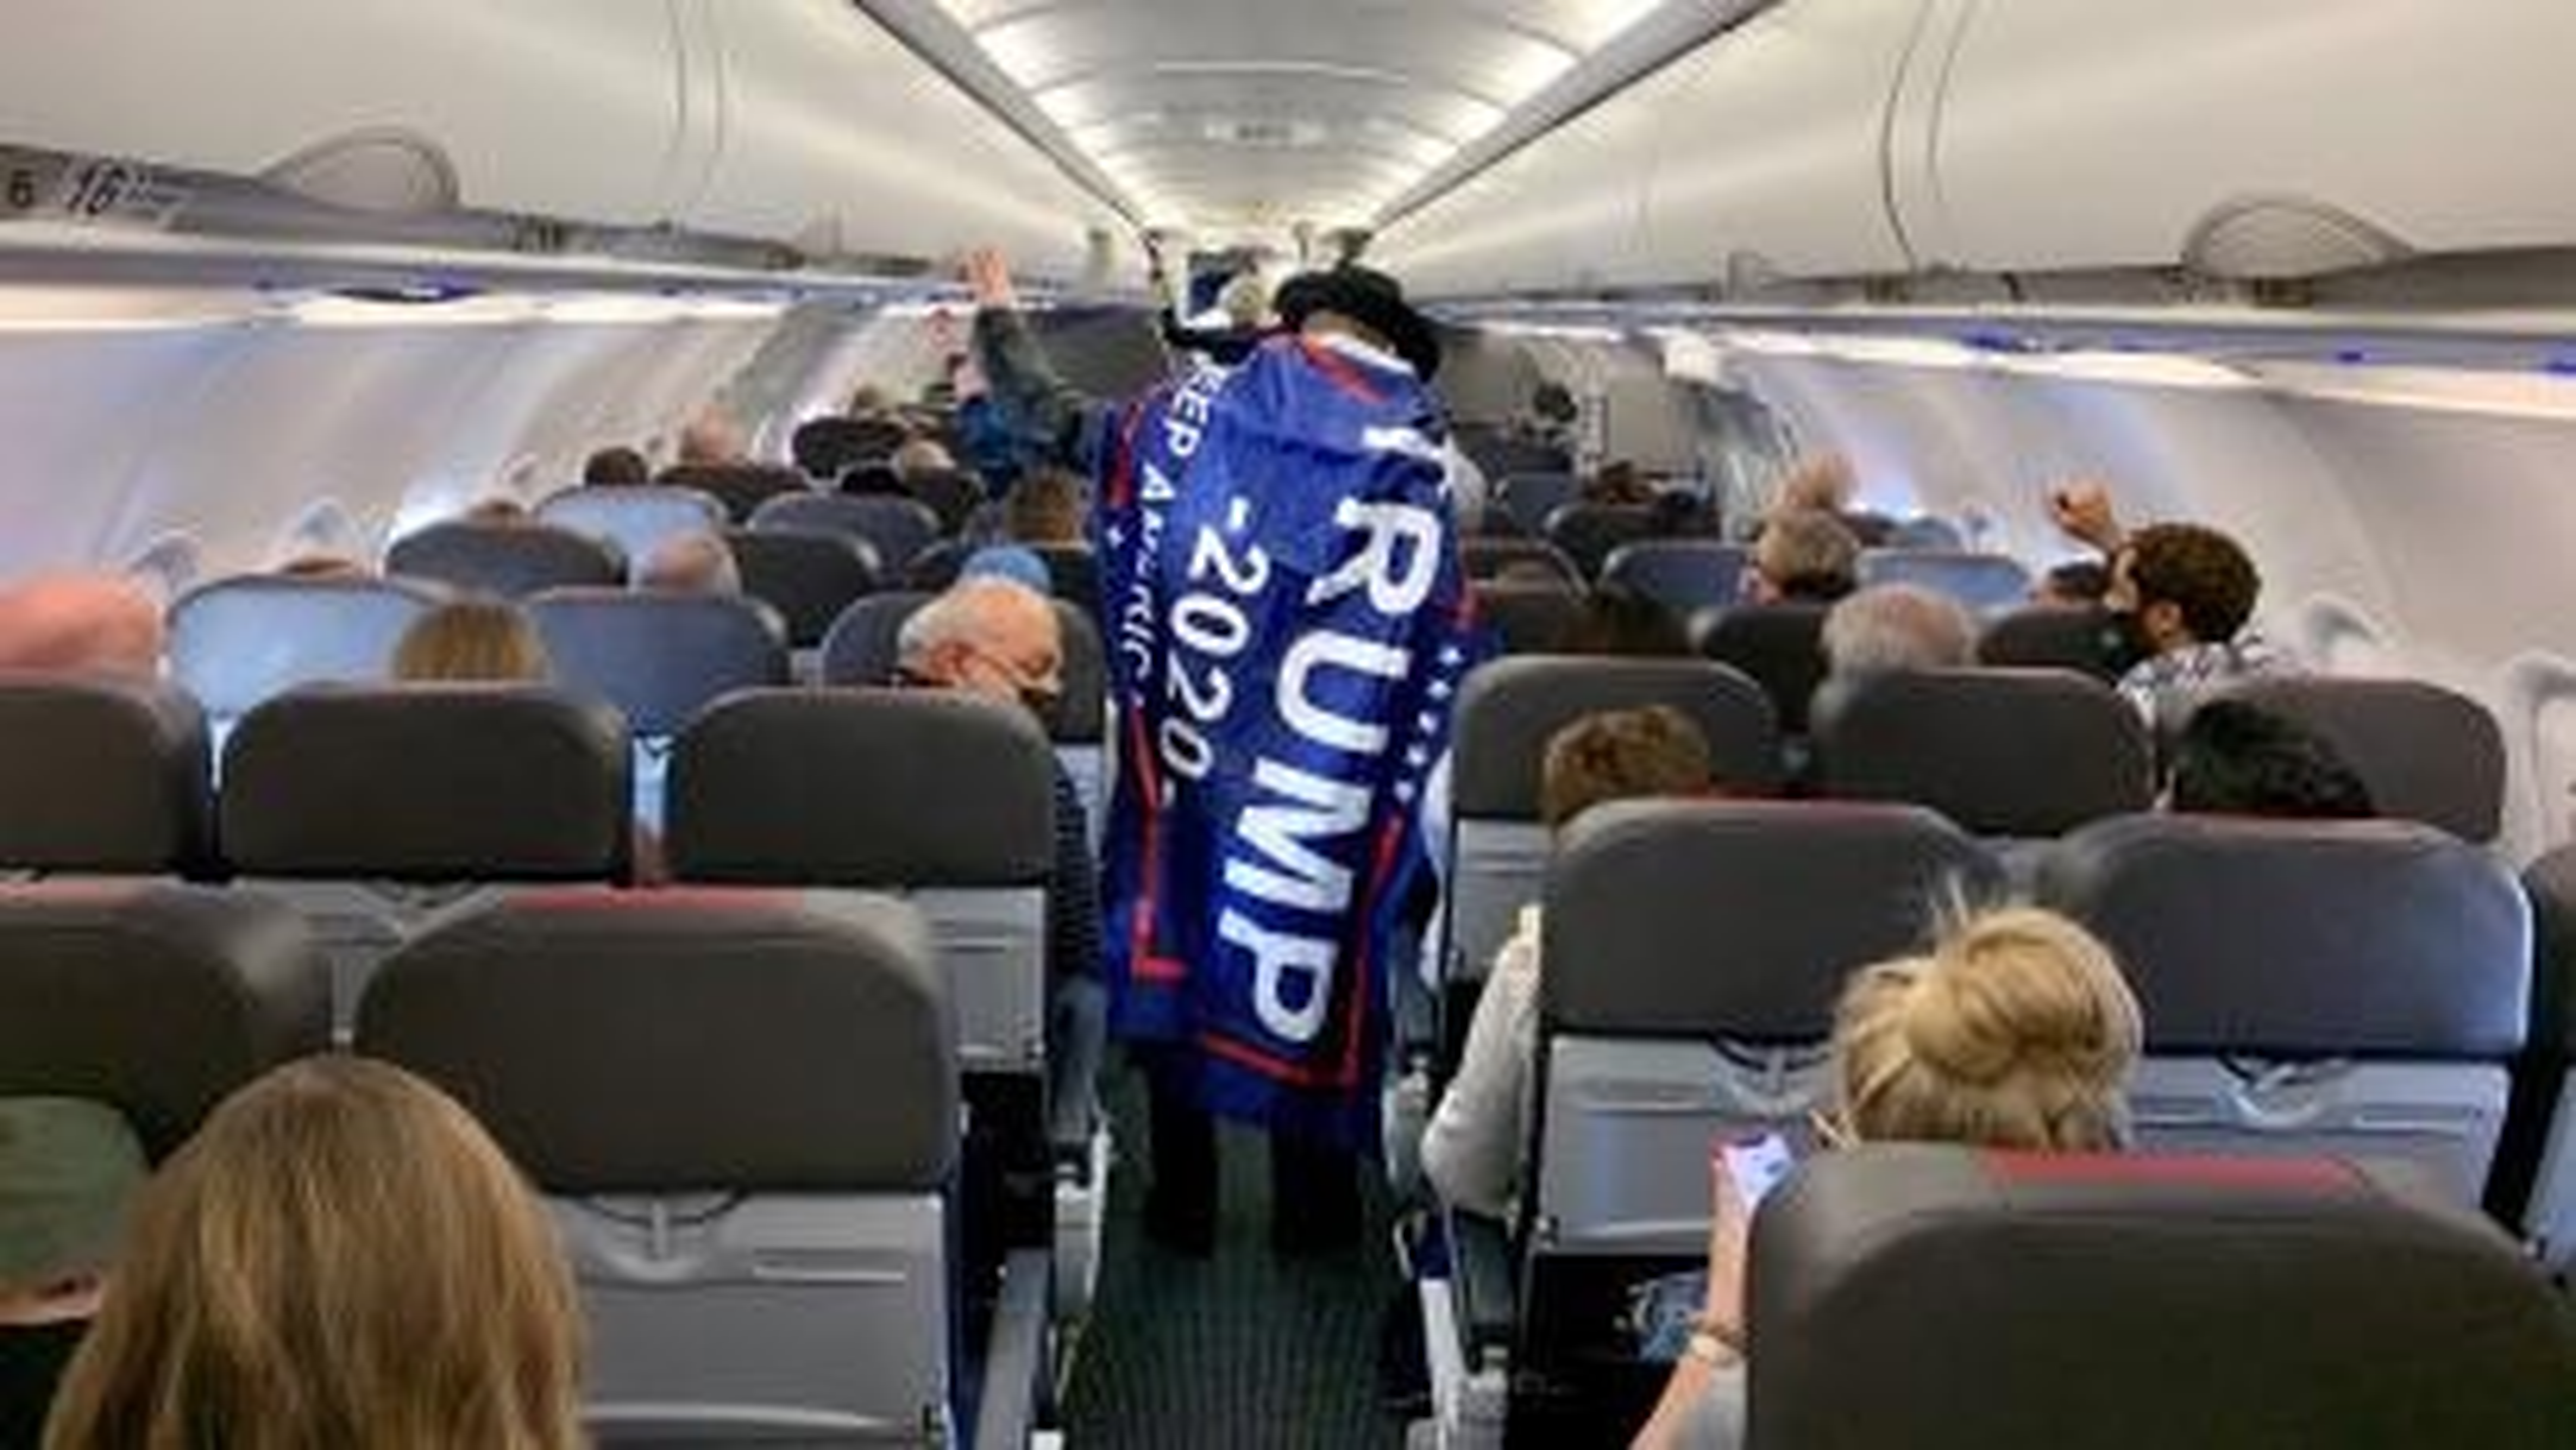 American Airlines flight prepares to depart Dallas/Fort Worth International Airport, Texas